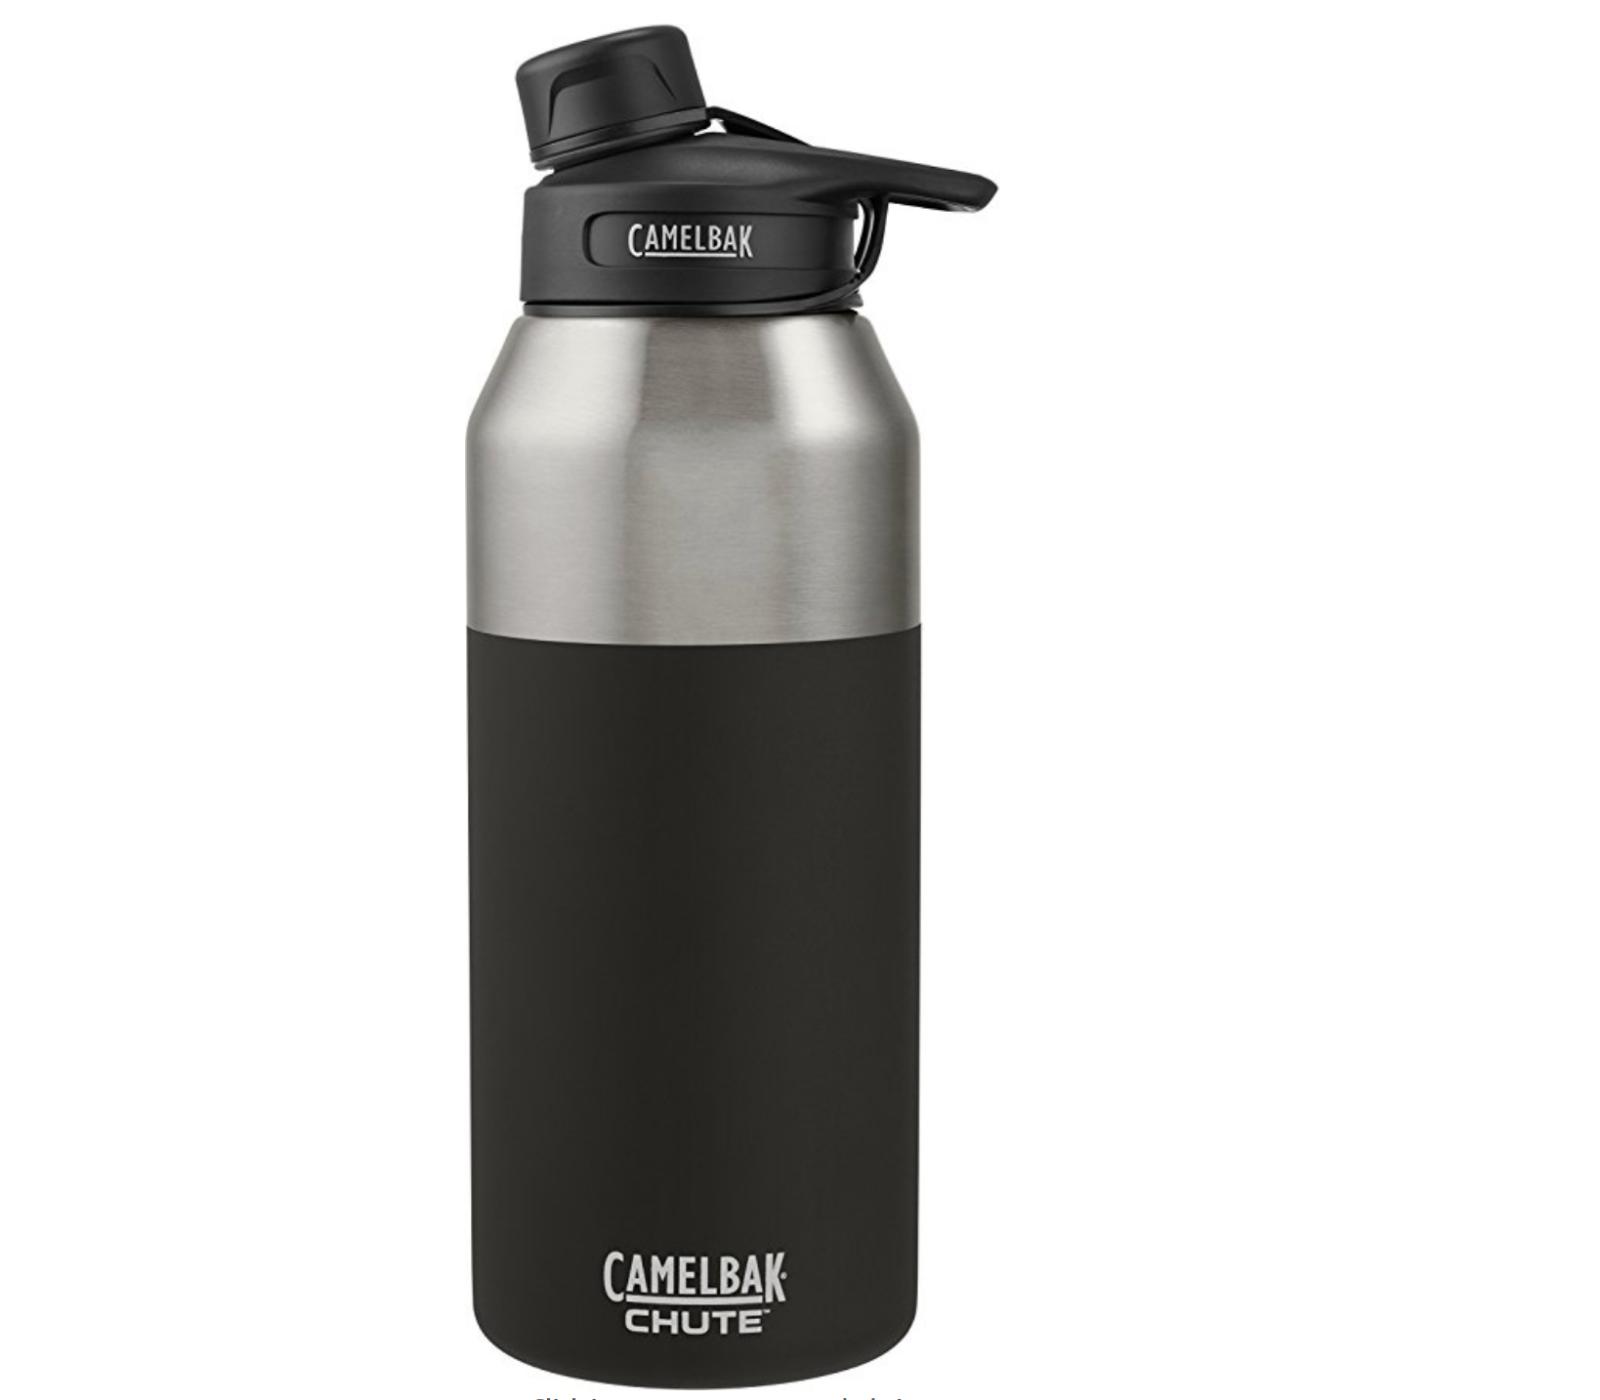 Jet DC/'d Camelbak Chute Vacuum Insulated Stainless 20oz Bottle